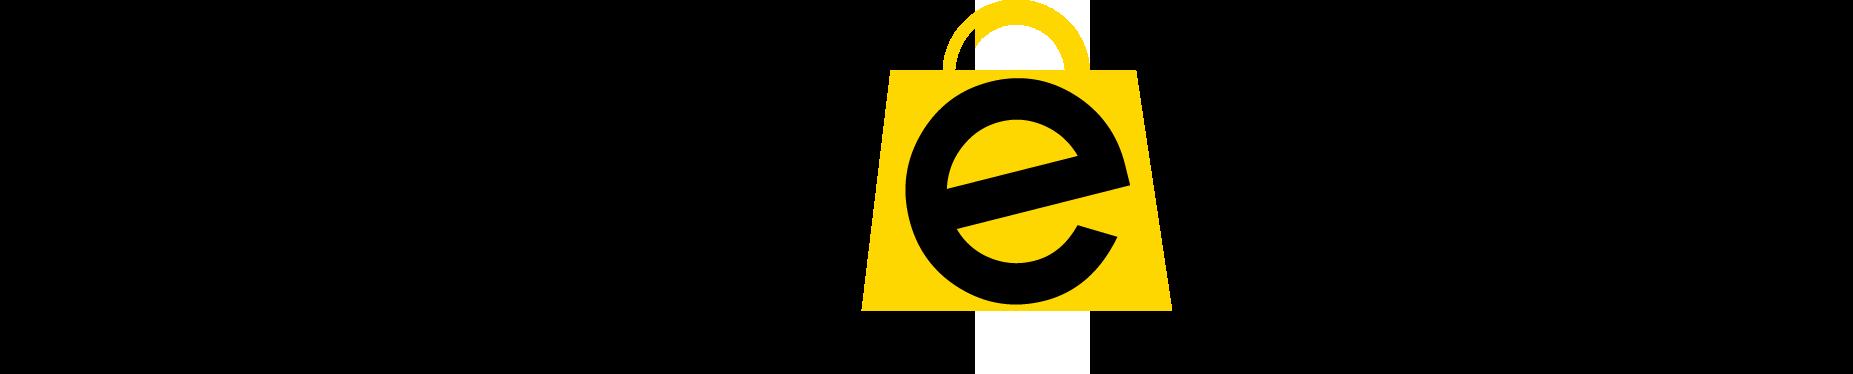 Buying E-store